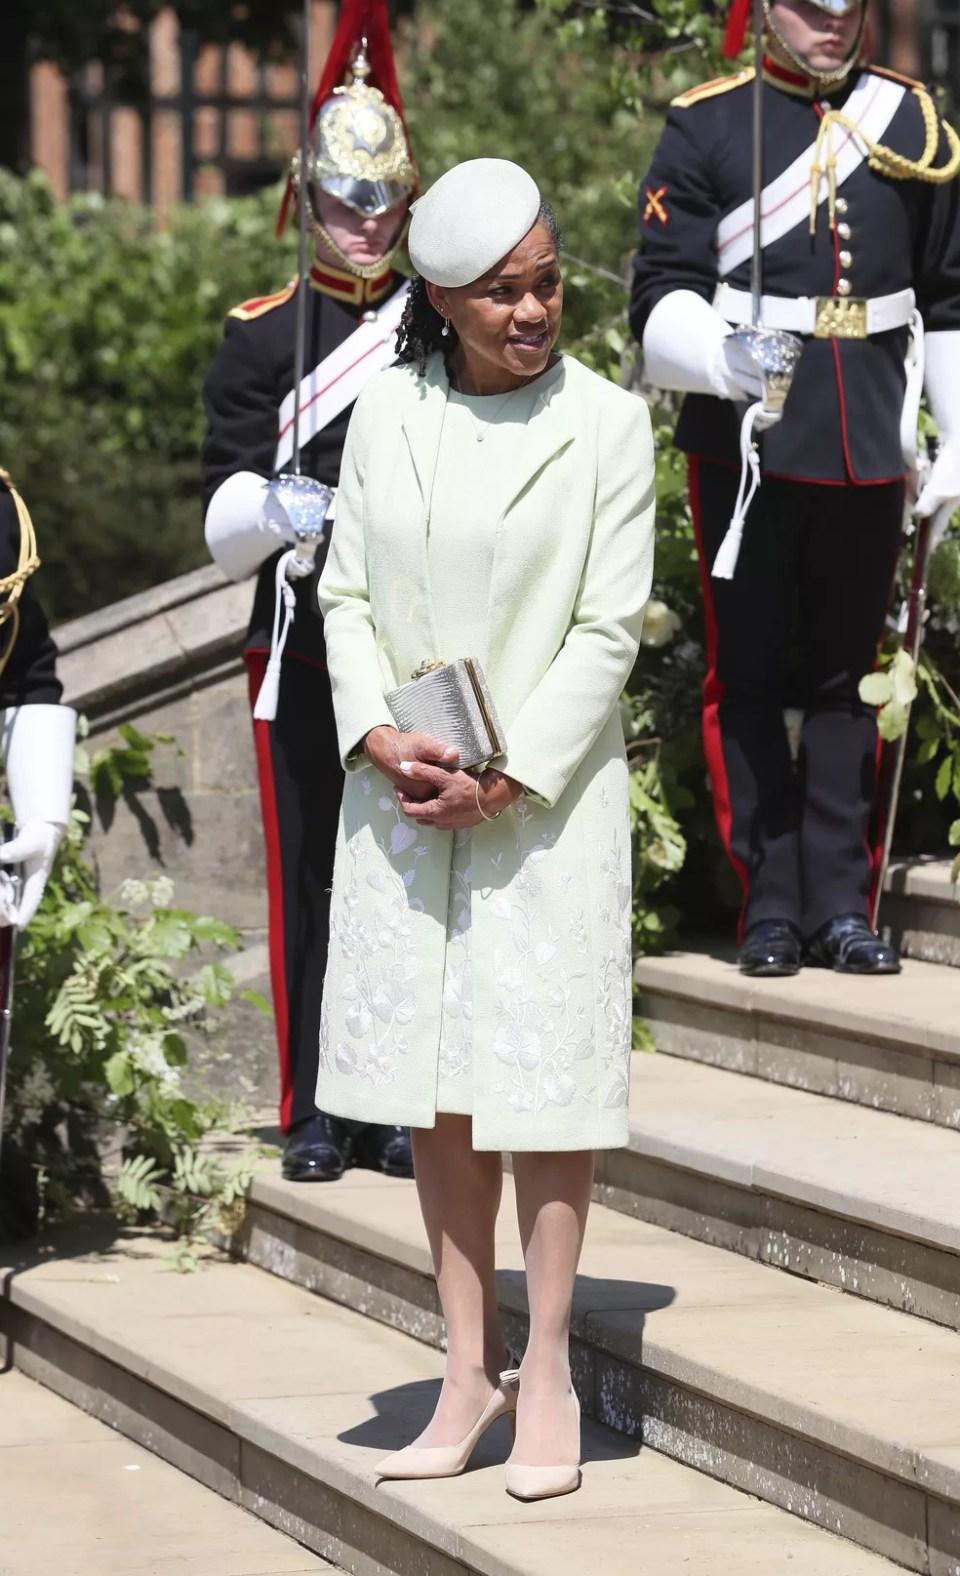 Doria Ragland, mãe de Meghan Markle, no Castelo de Windsor (Foto: Brian Lawless/pool photo via AP)